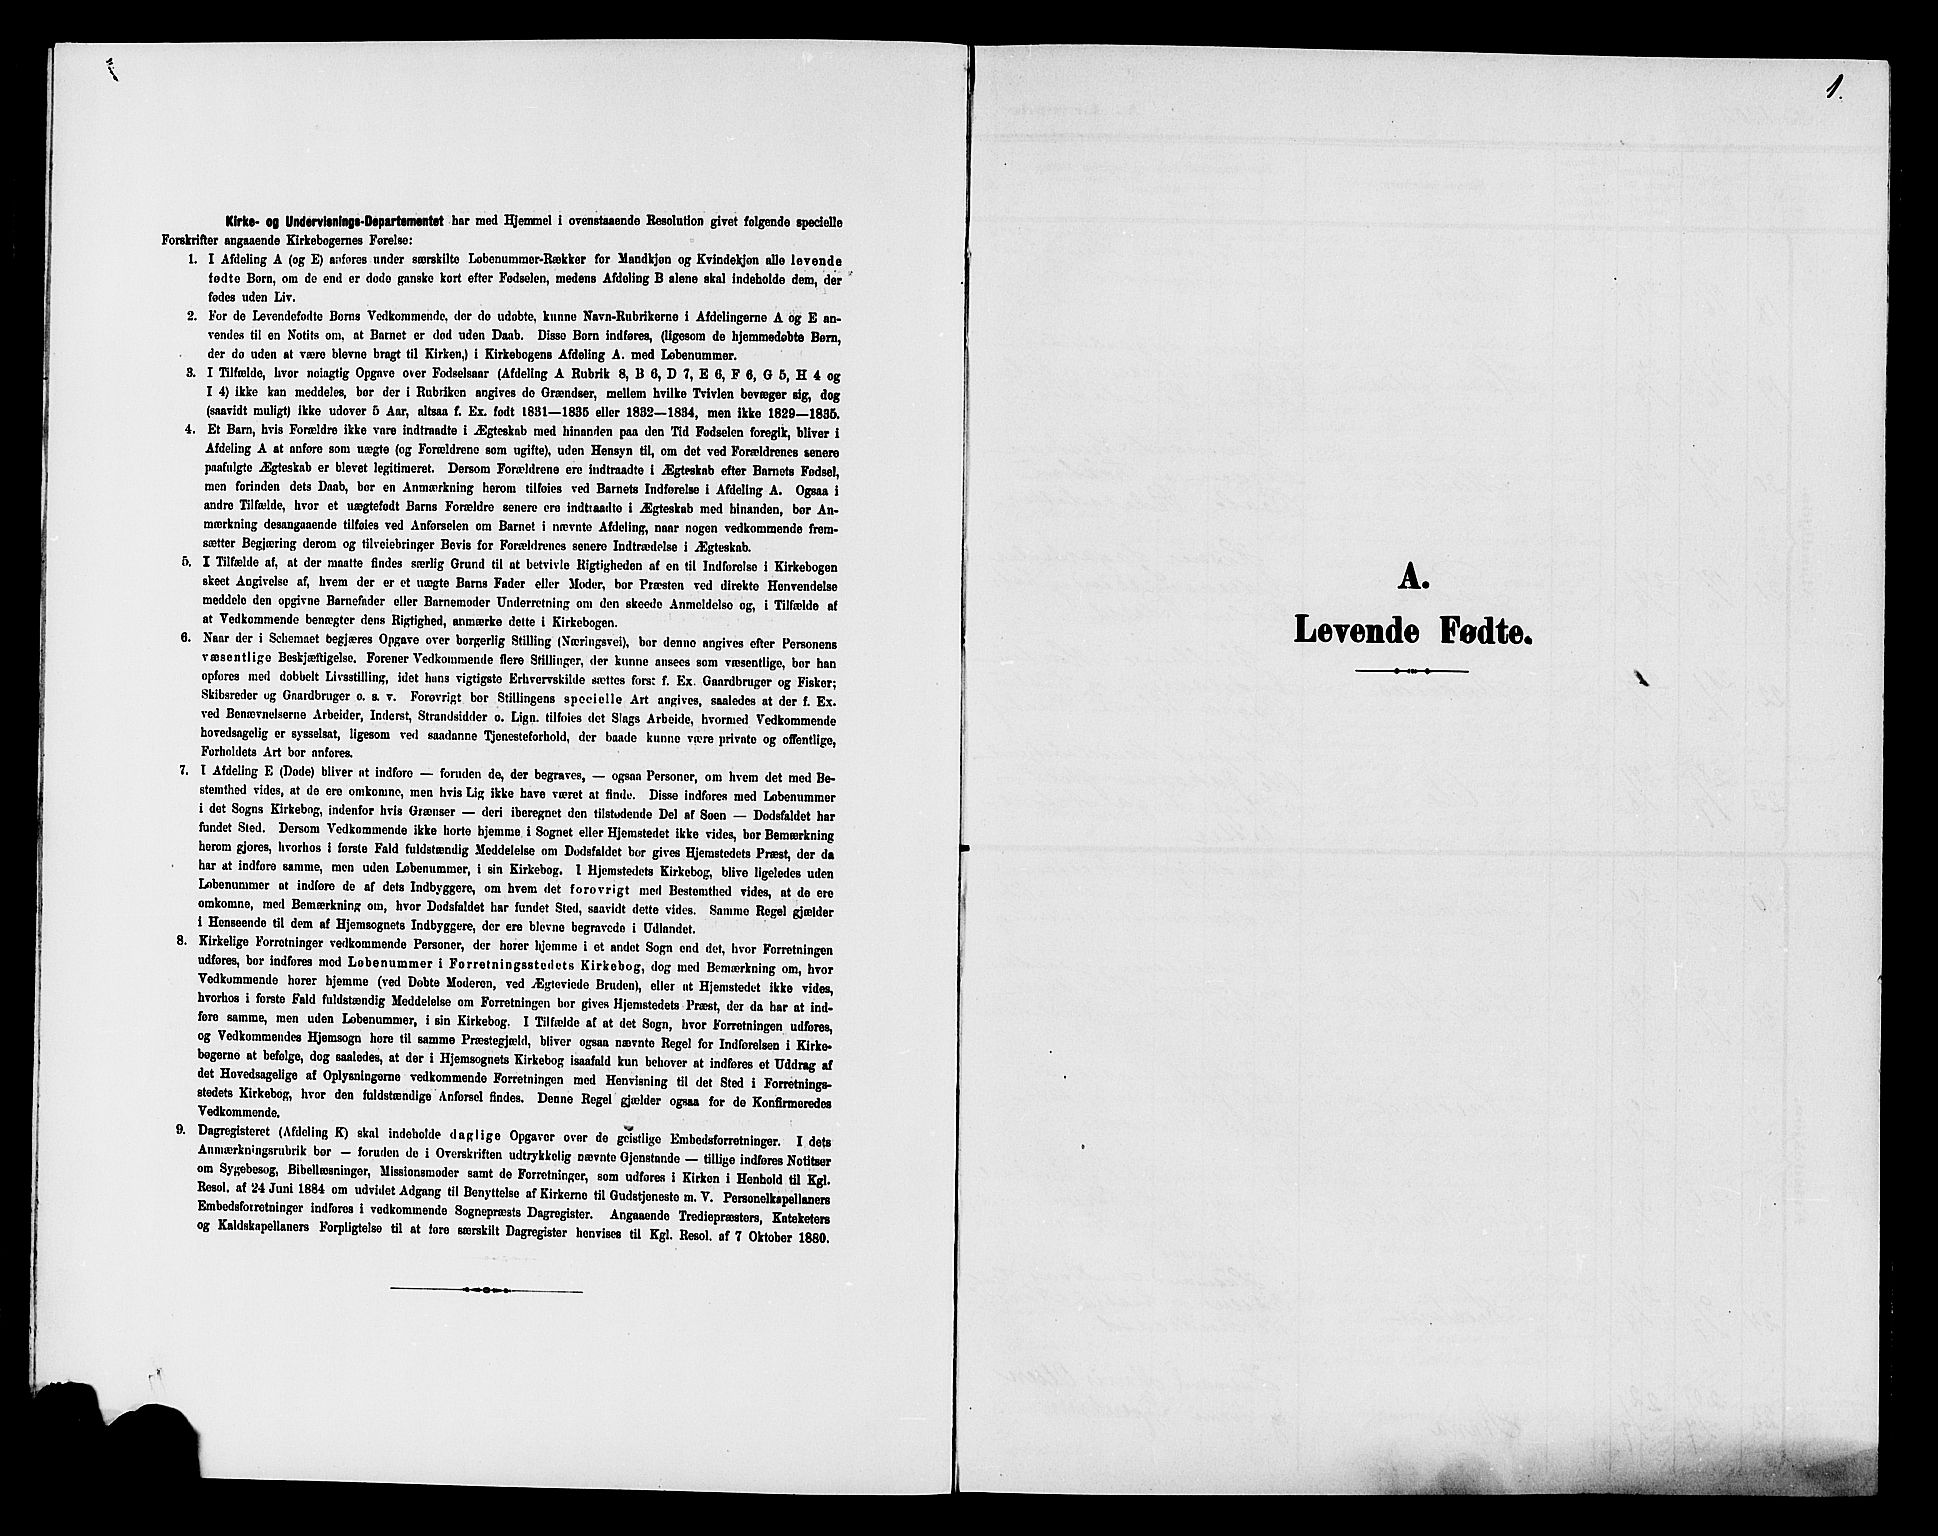 SAH, Søndre Land prestekontor, L/L0005: Klokkerbok nr. 5, 1902-1911, s. 1